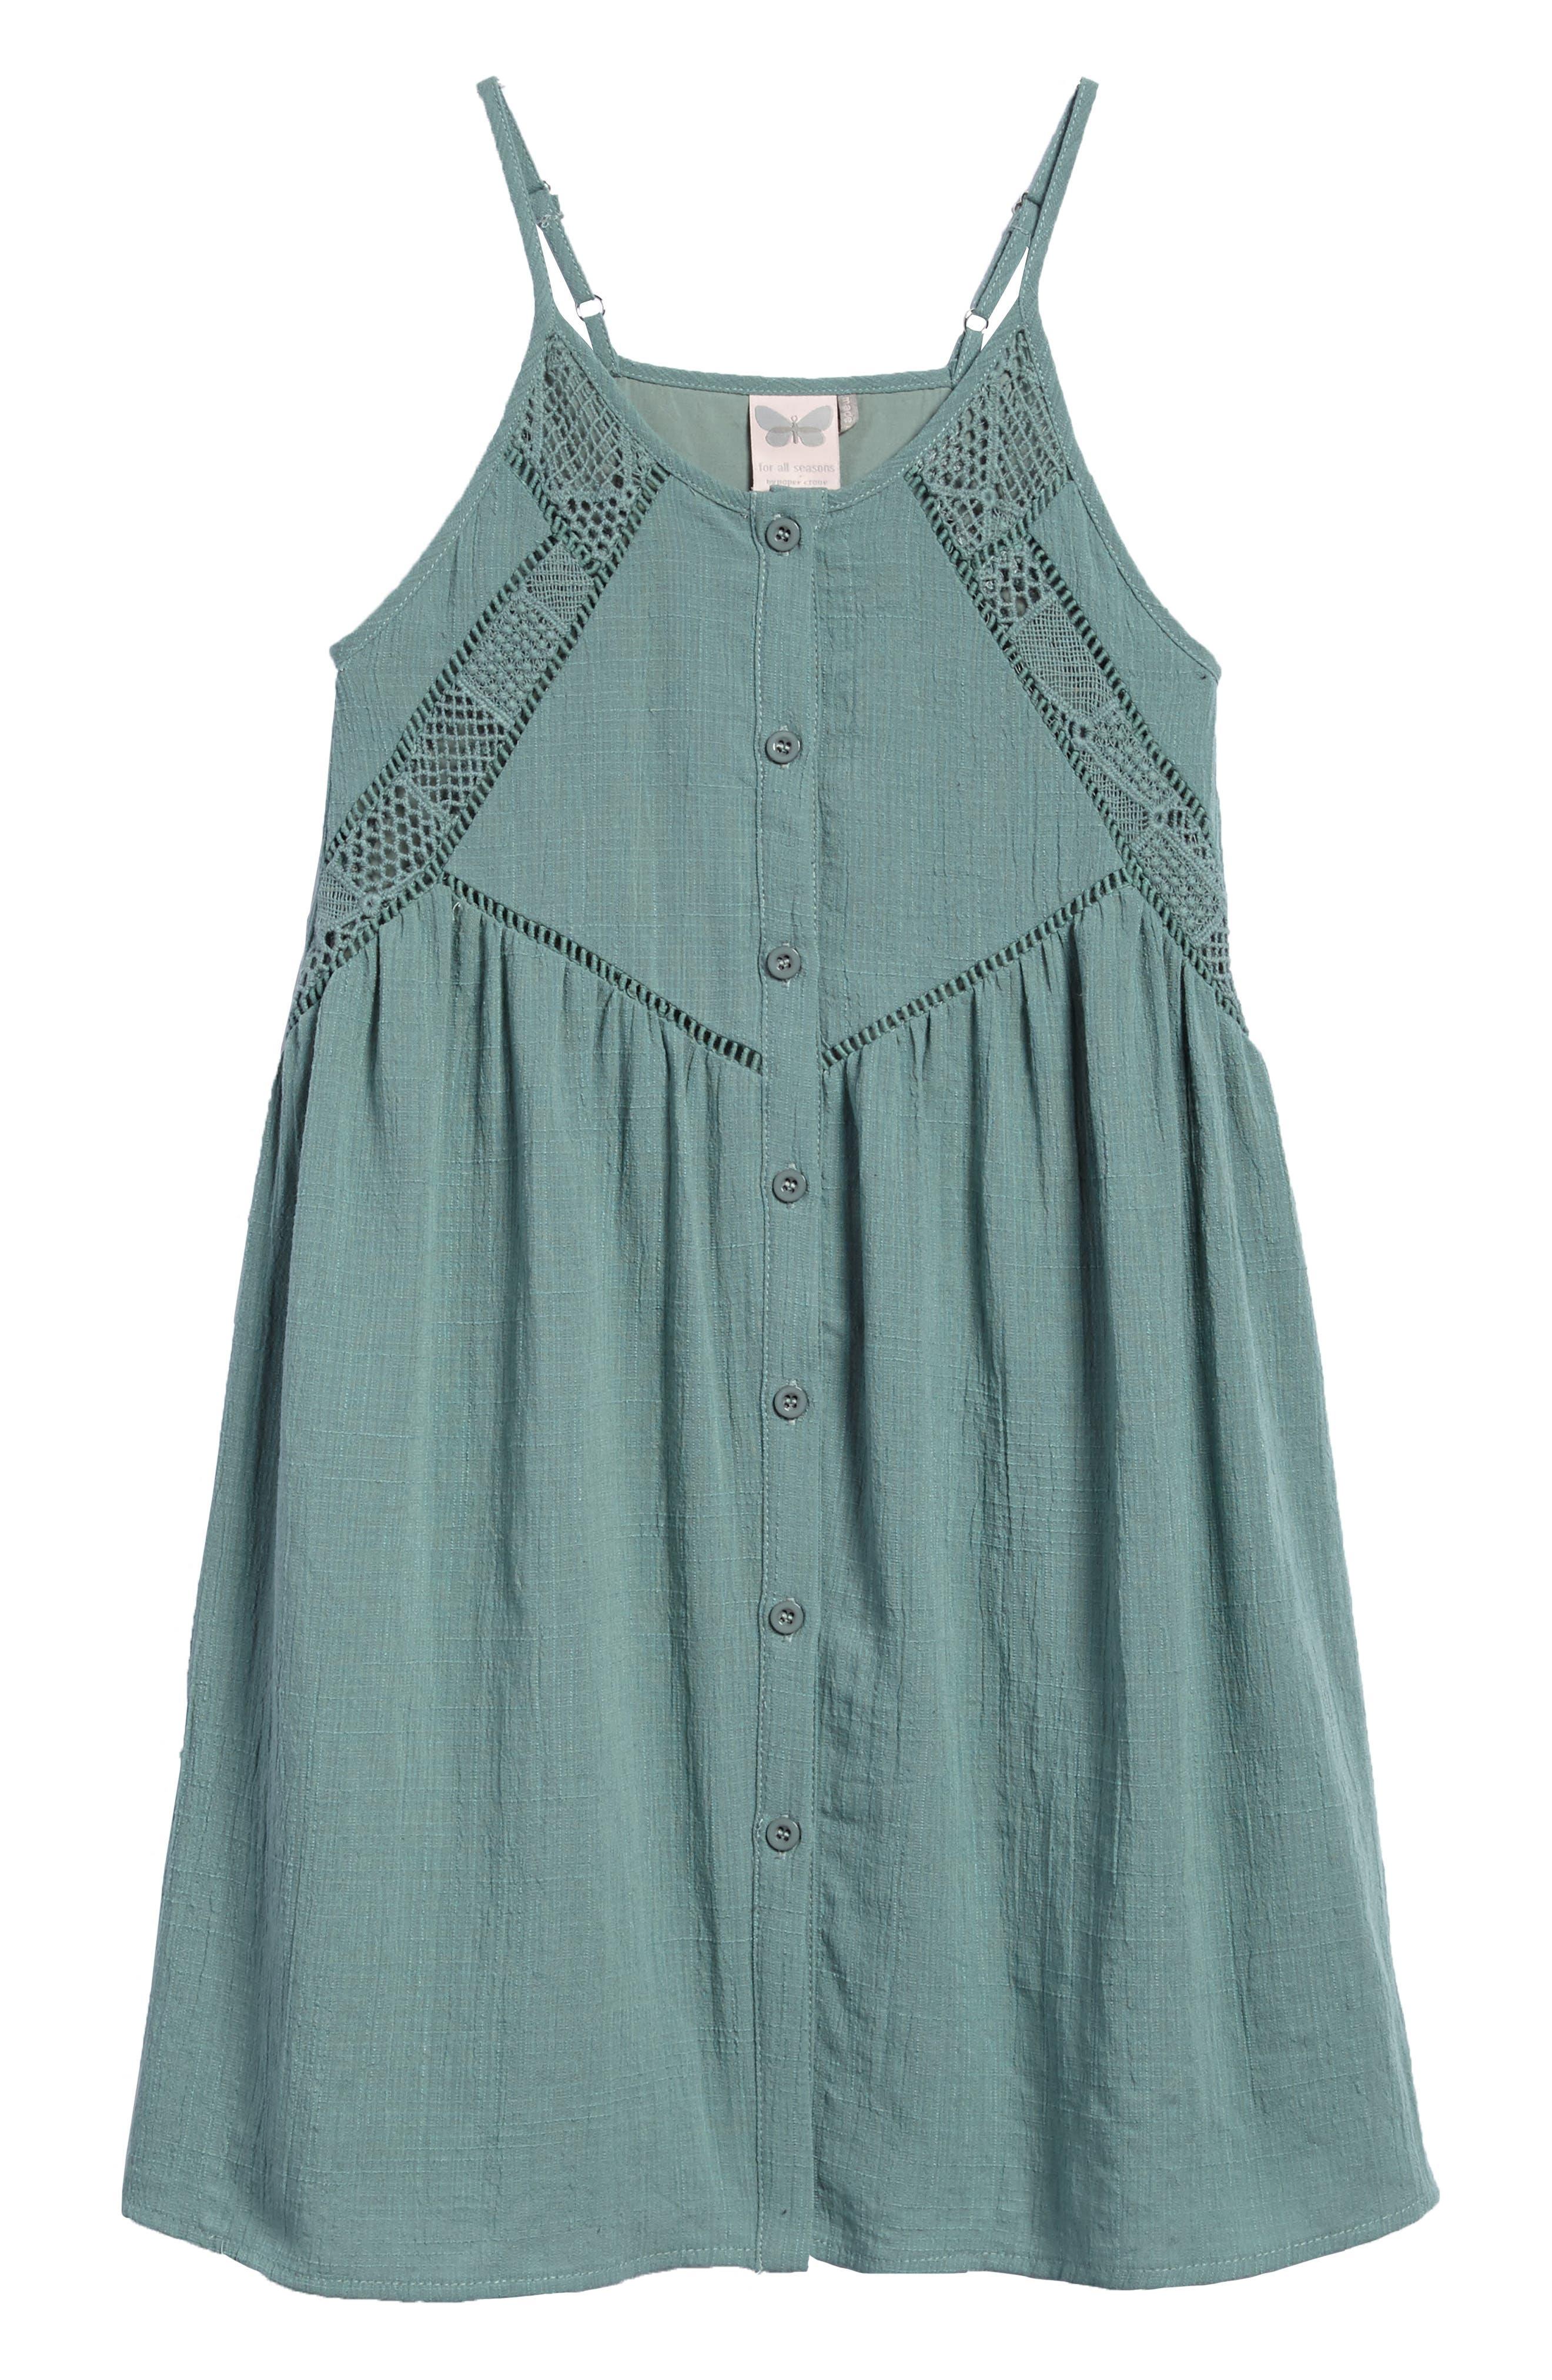 For All Season Woven Tank Dress,                             Main thumbnail 1, color,                             300